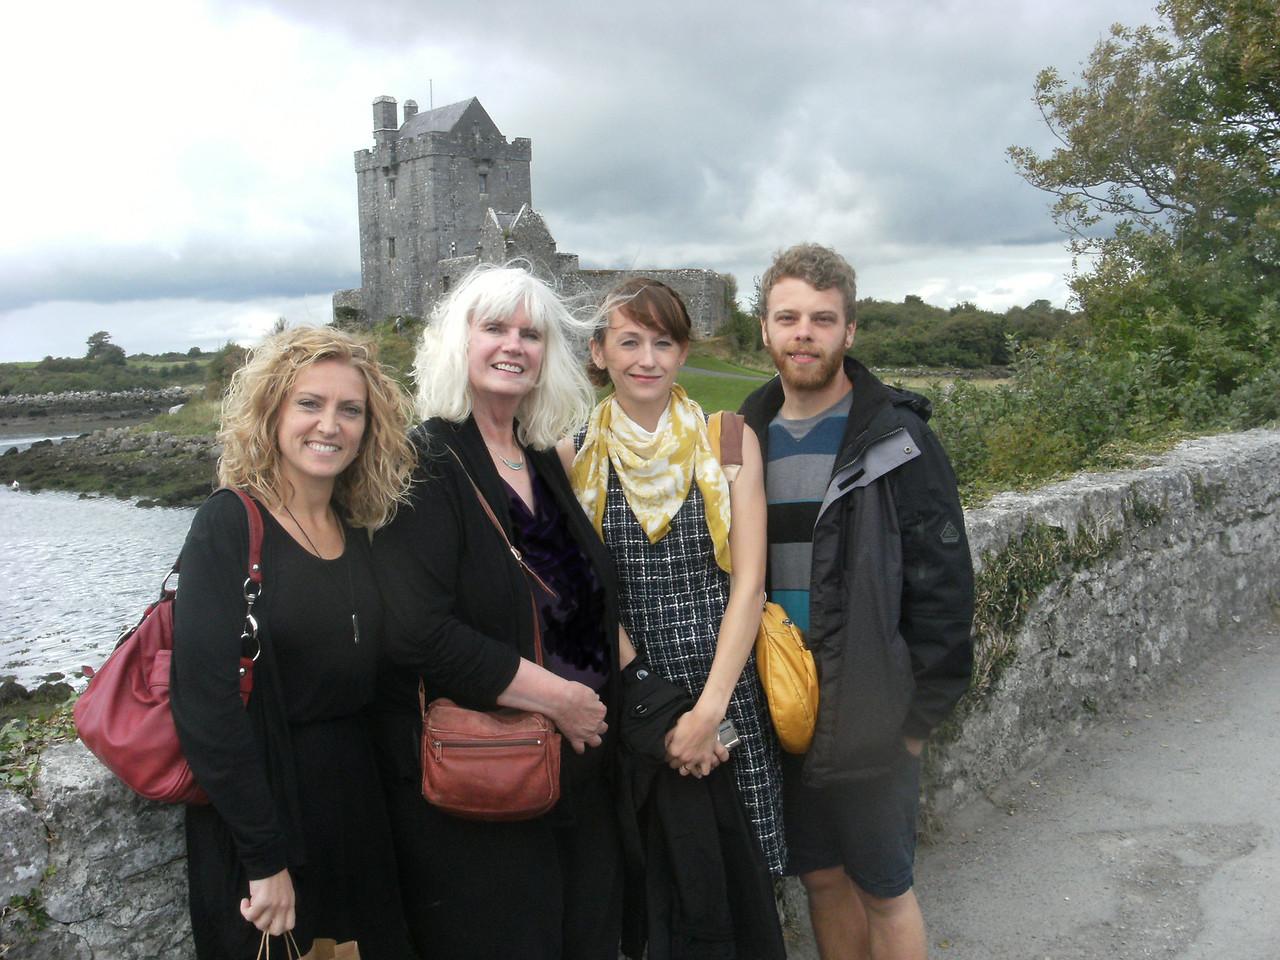 Lynsey, Joy, Heather, Forrest near Dunquire Castle